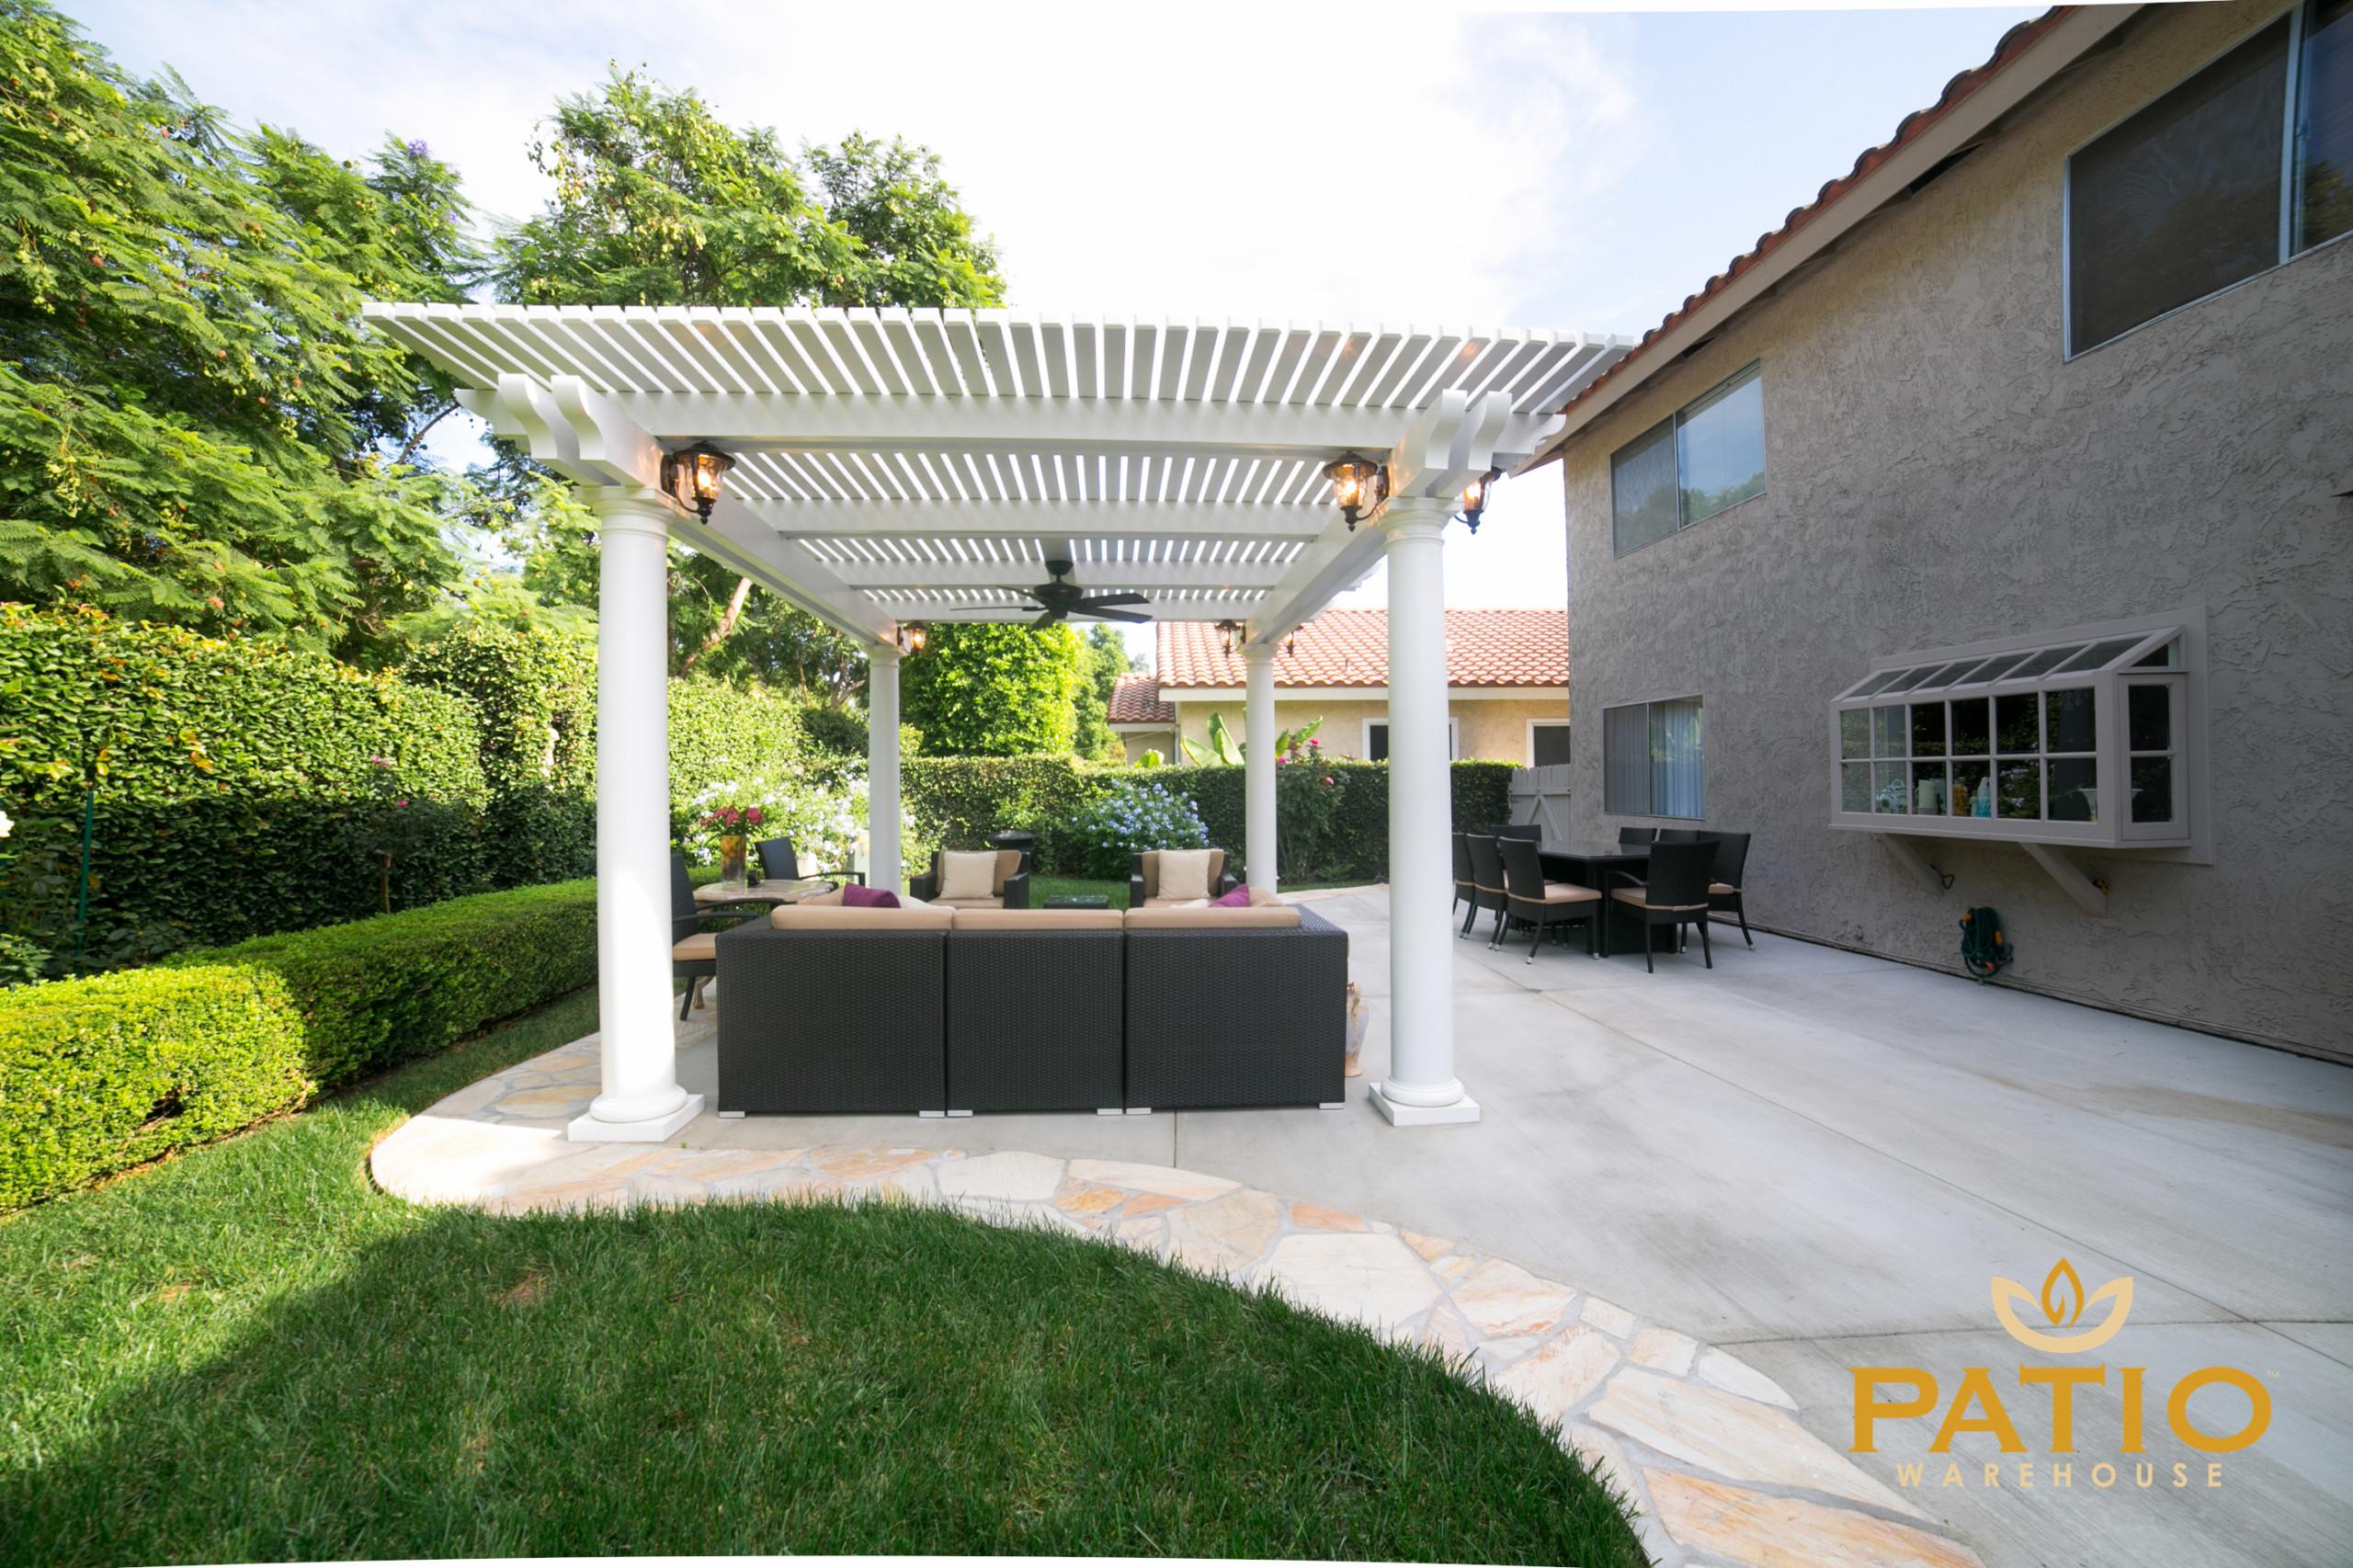 elitewood lattice patio covers modern